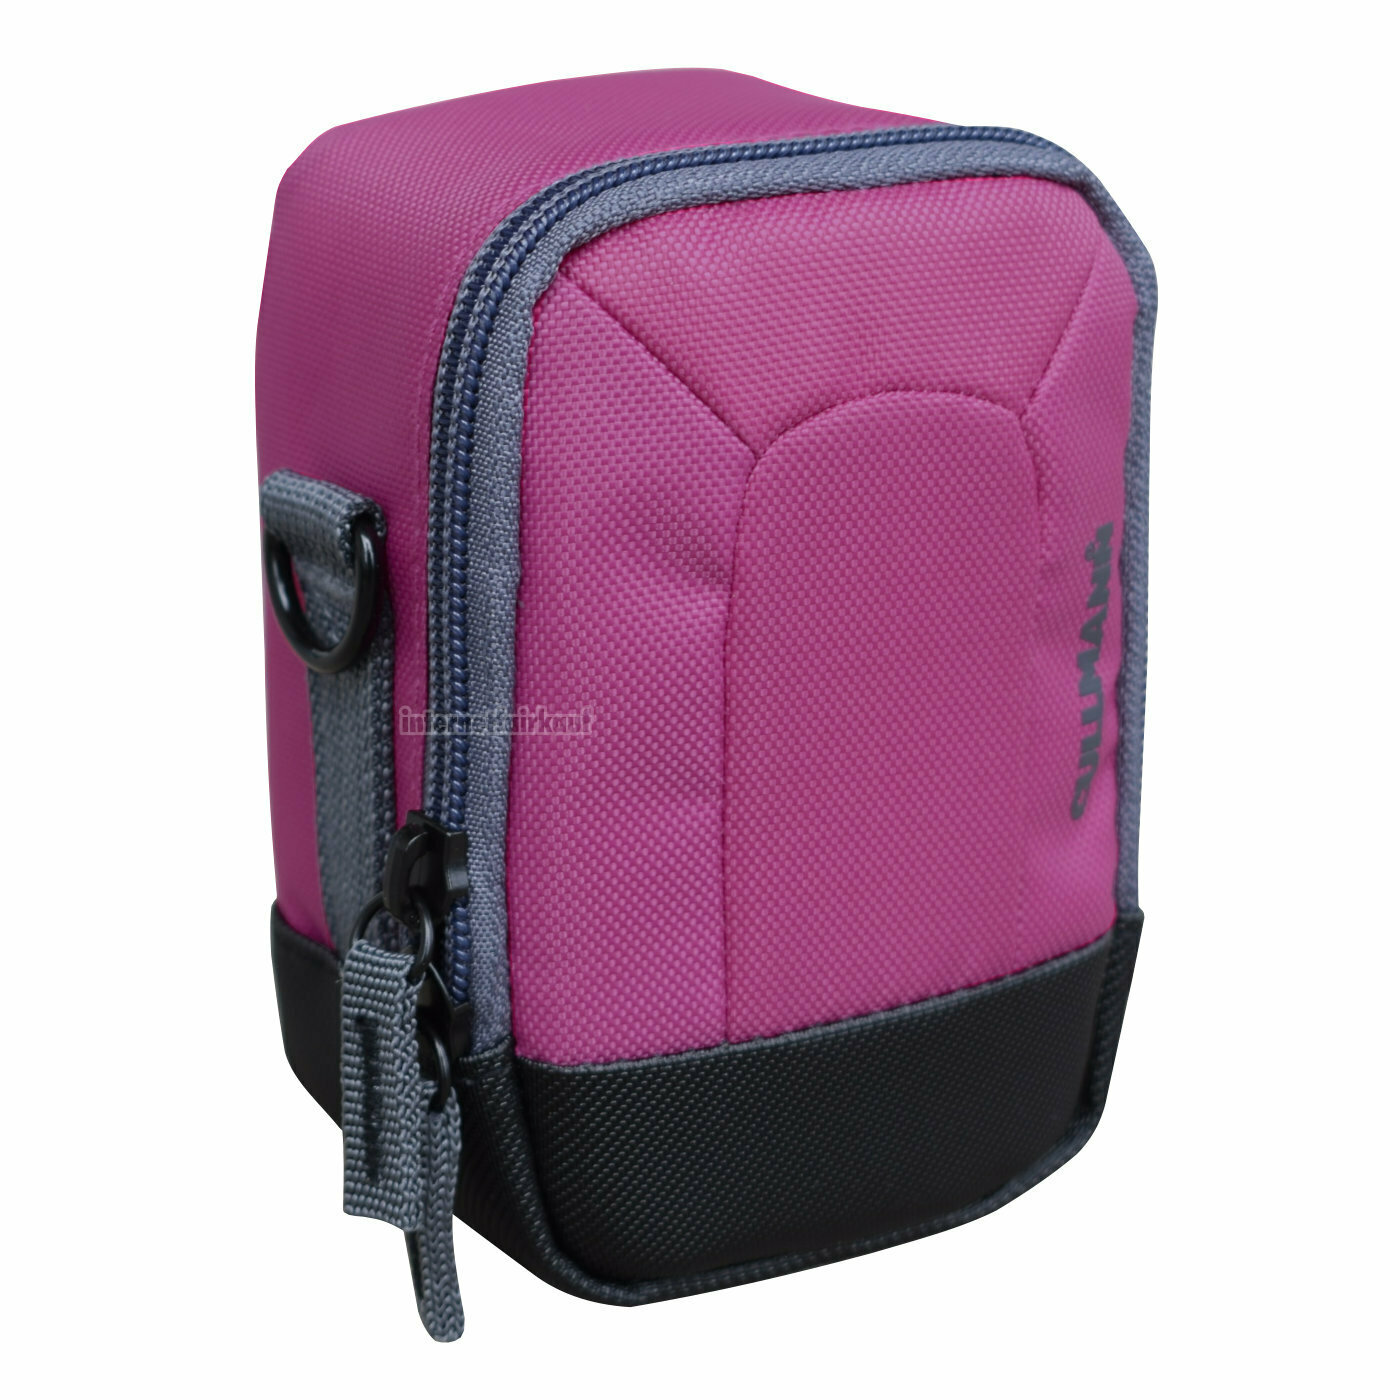 Kameratasche purple passend für Fuji Fujifilm XF10